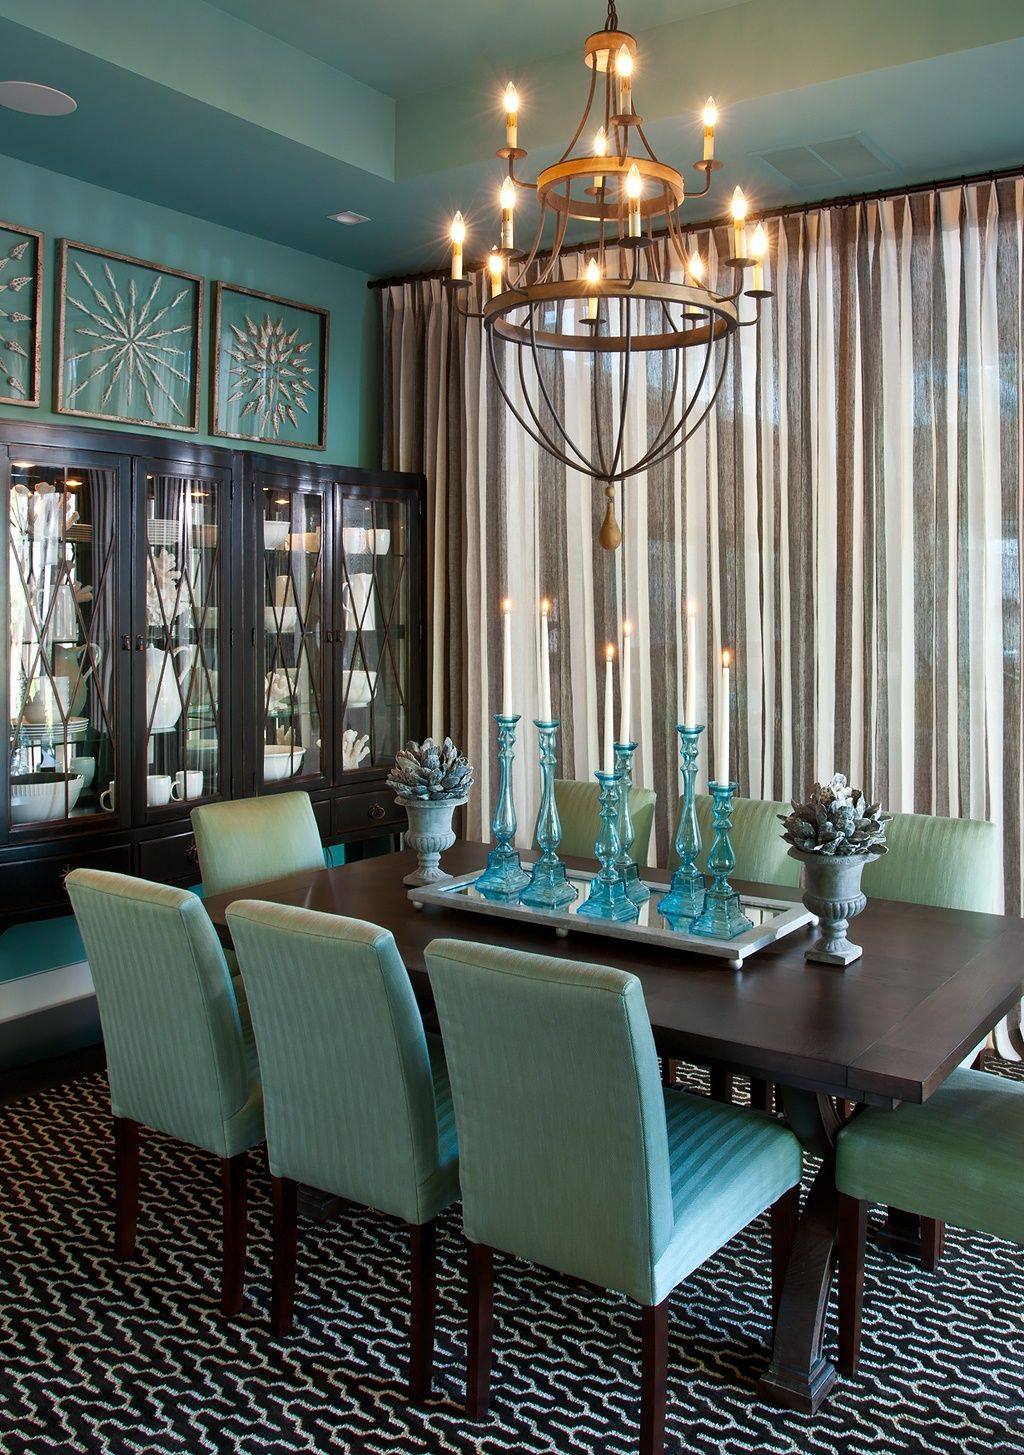 Detali Kuhnya Stolovaya Turquoise Dining Room Coastal Dining Room Eclectic Dining Room